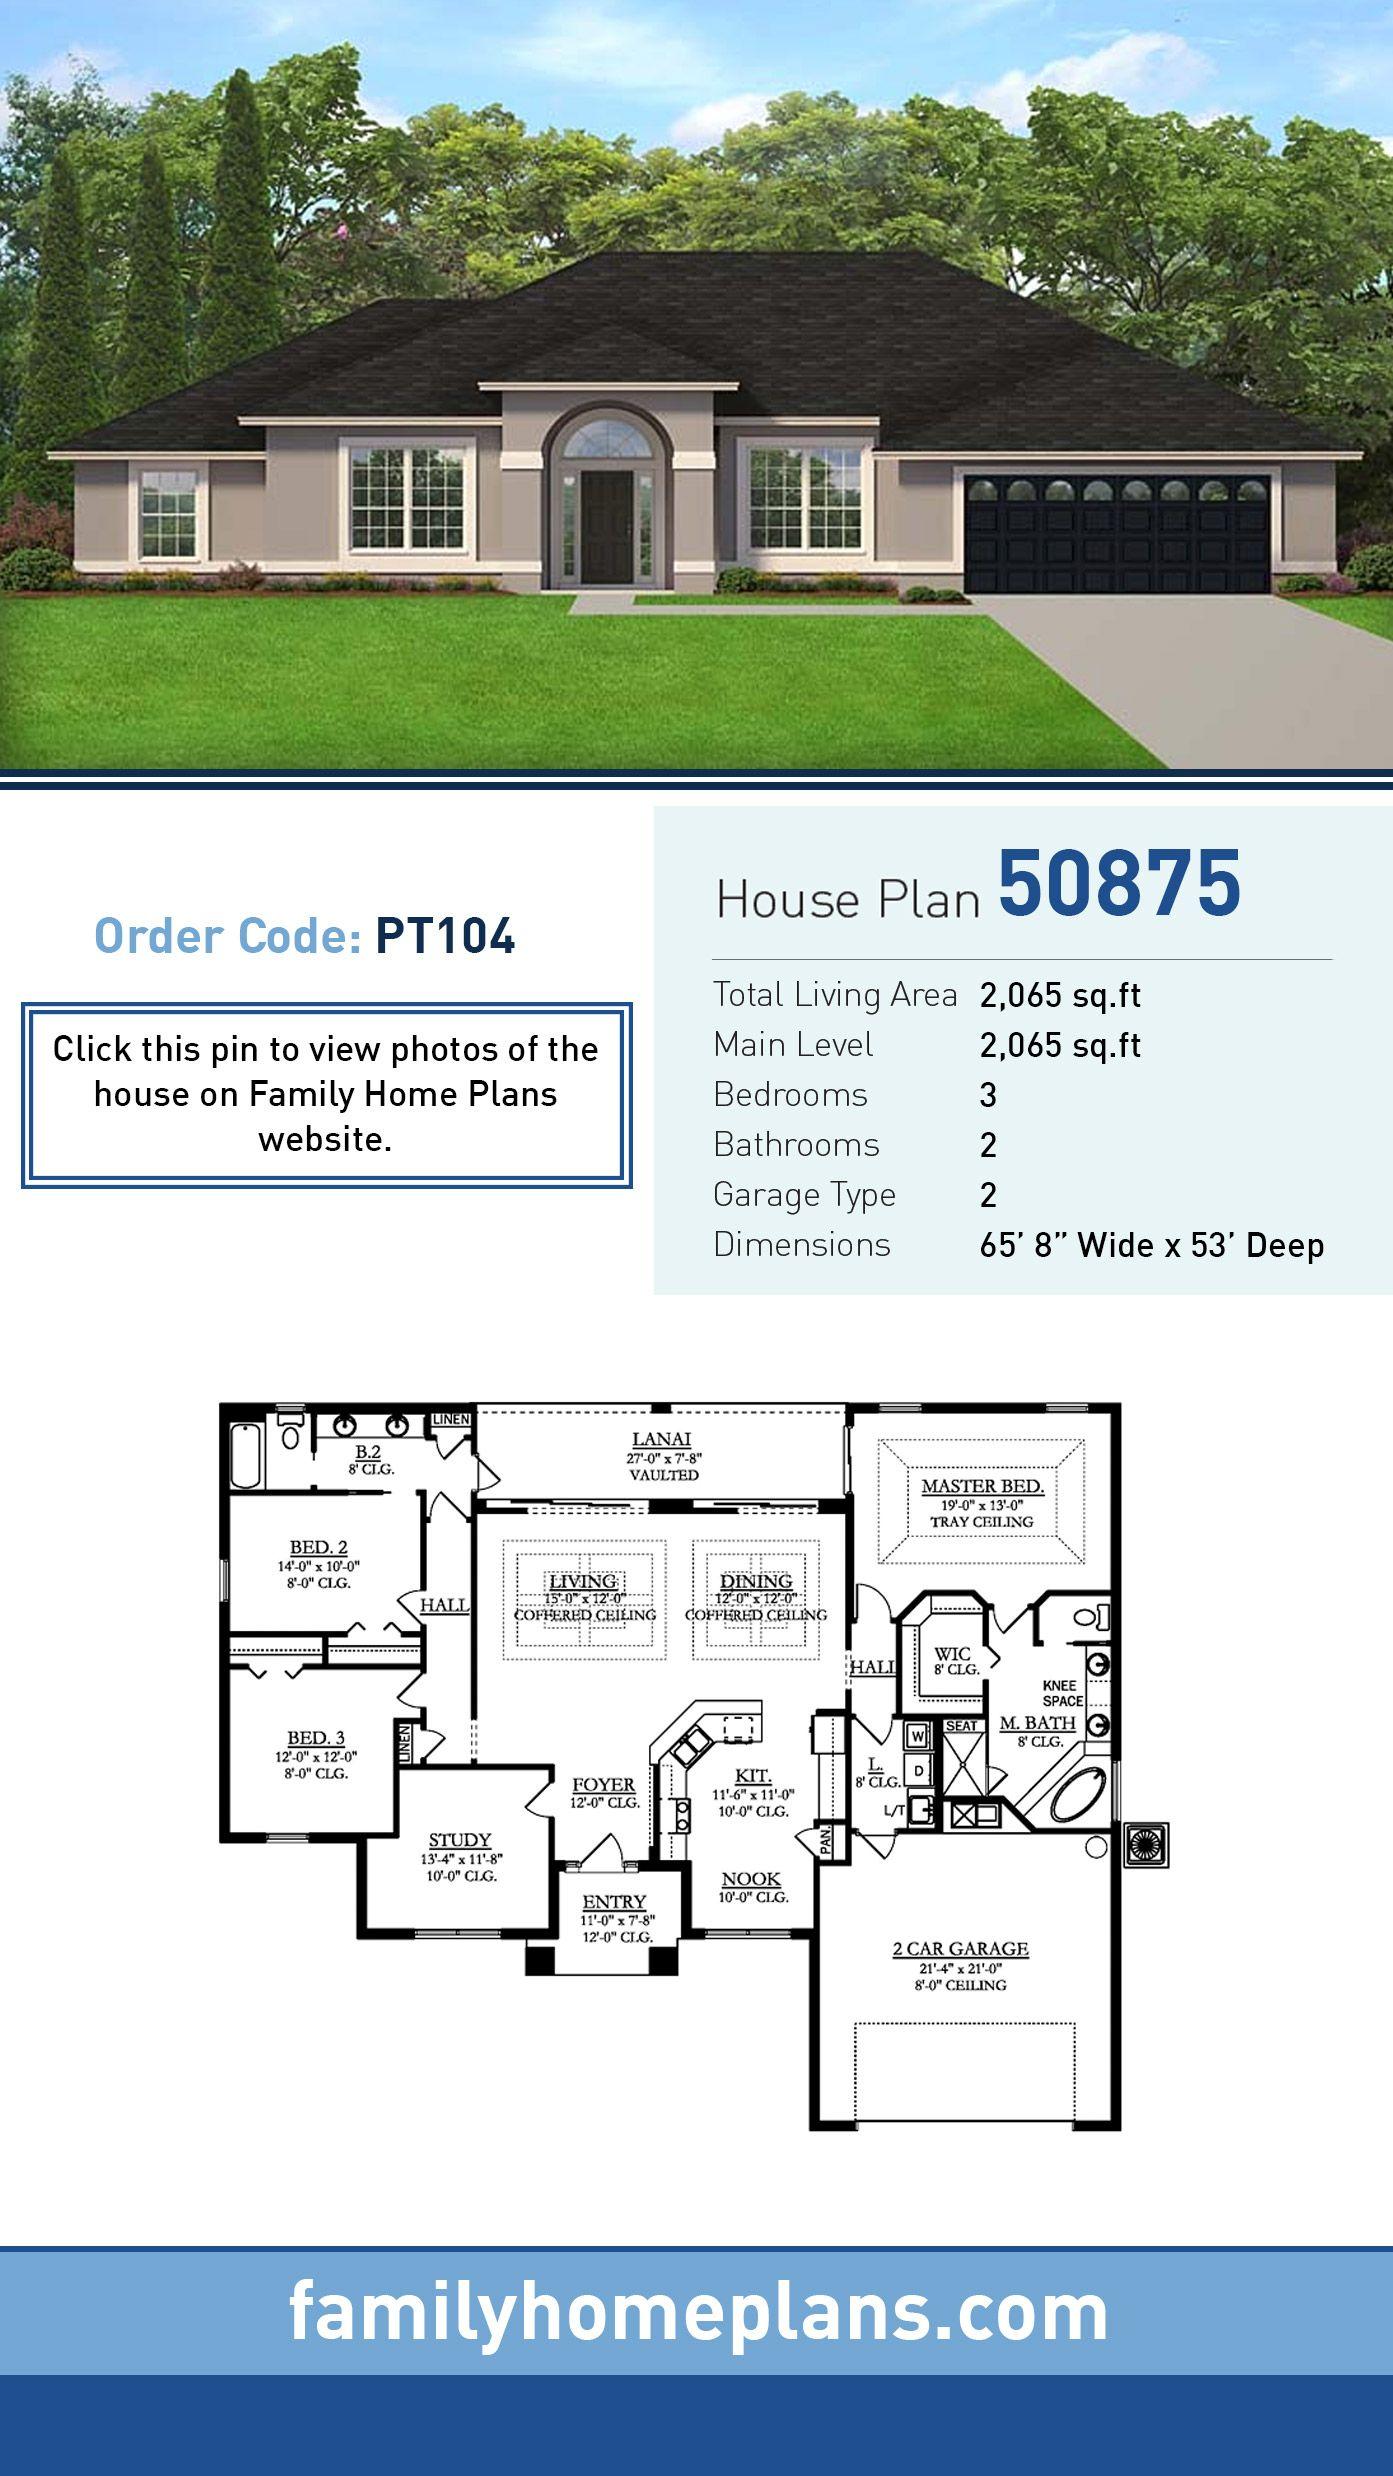 Plan 50875 Florida House Plans Family House Plans Beautiful House Plans